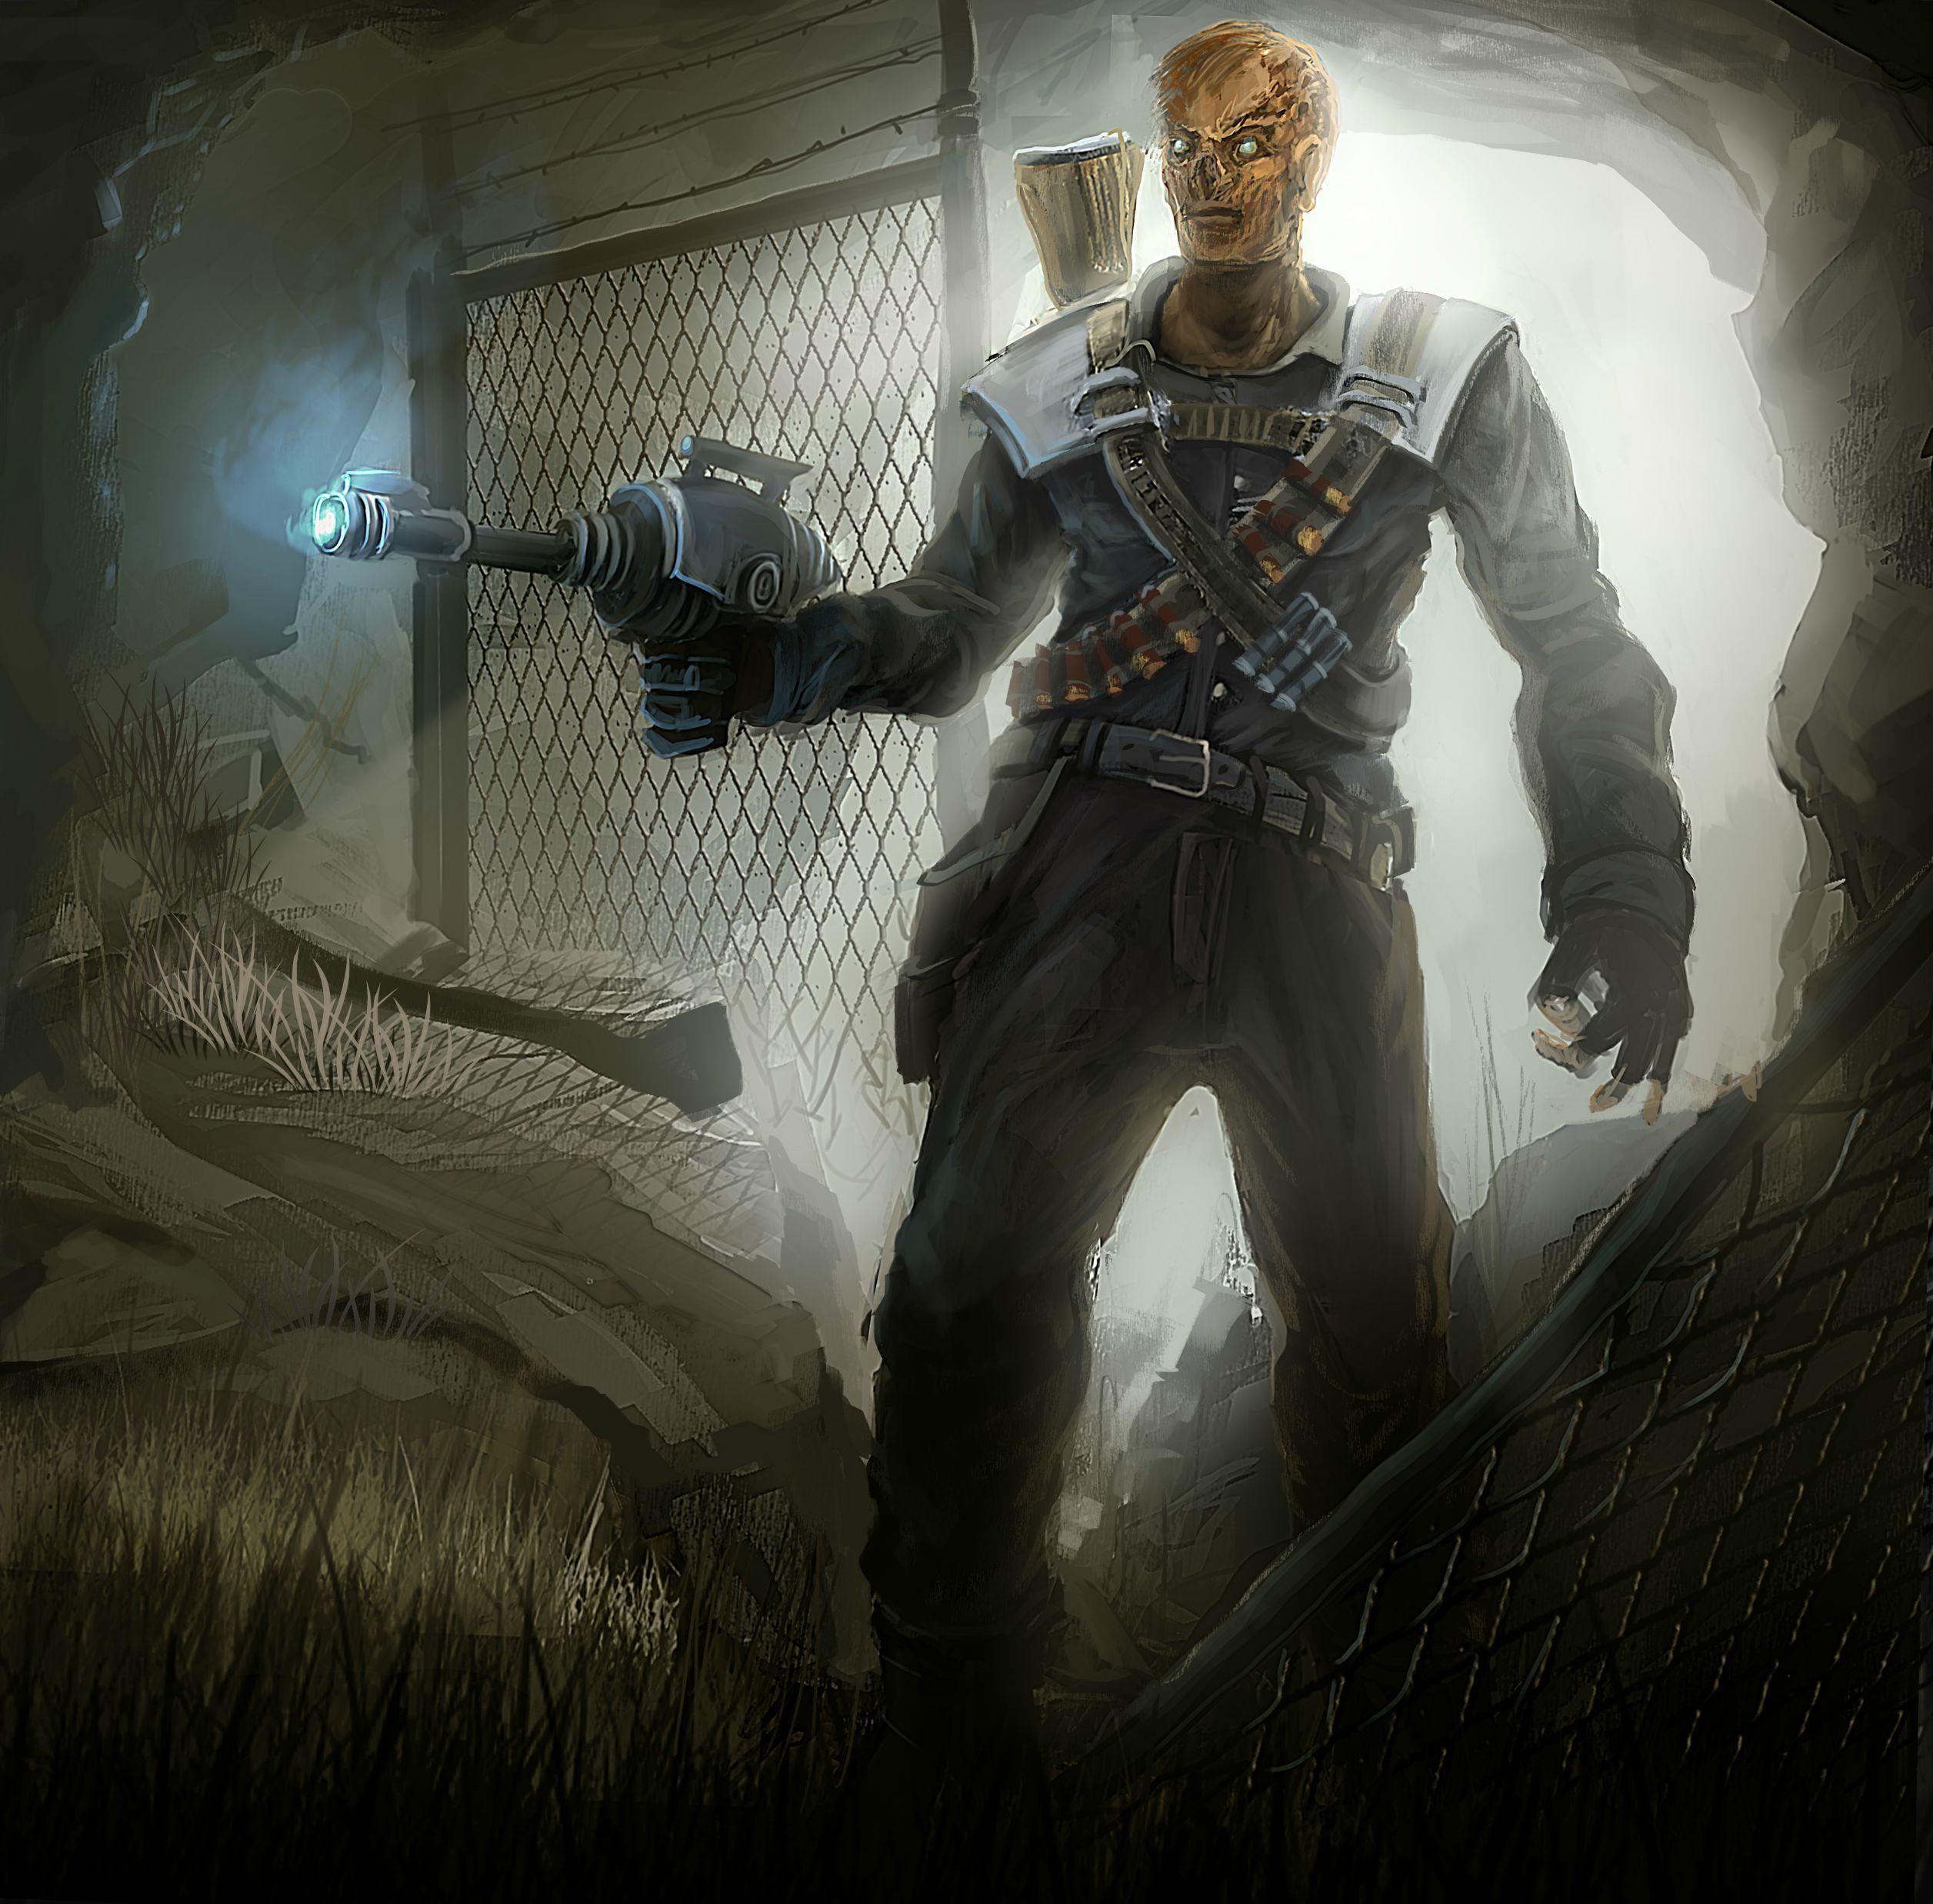 Fallout 3 Charon By Mrliquidose Fallout Cosplay Fallout